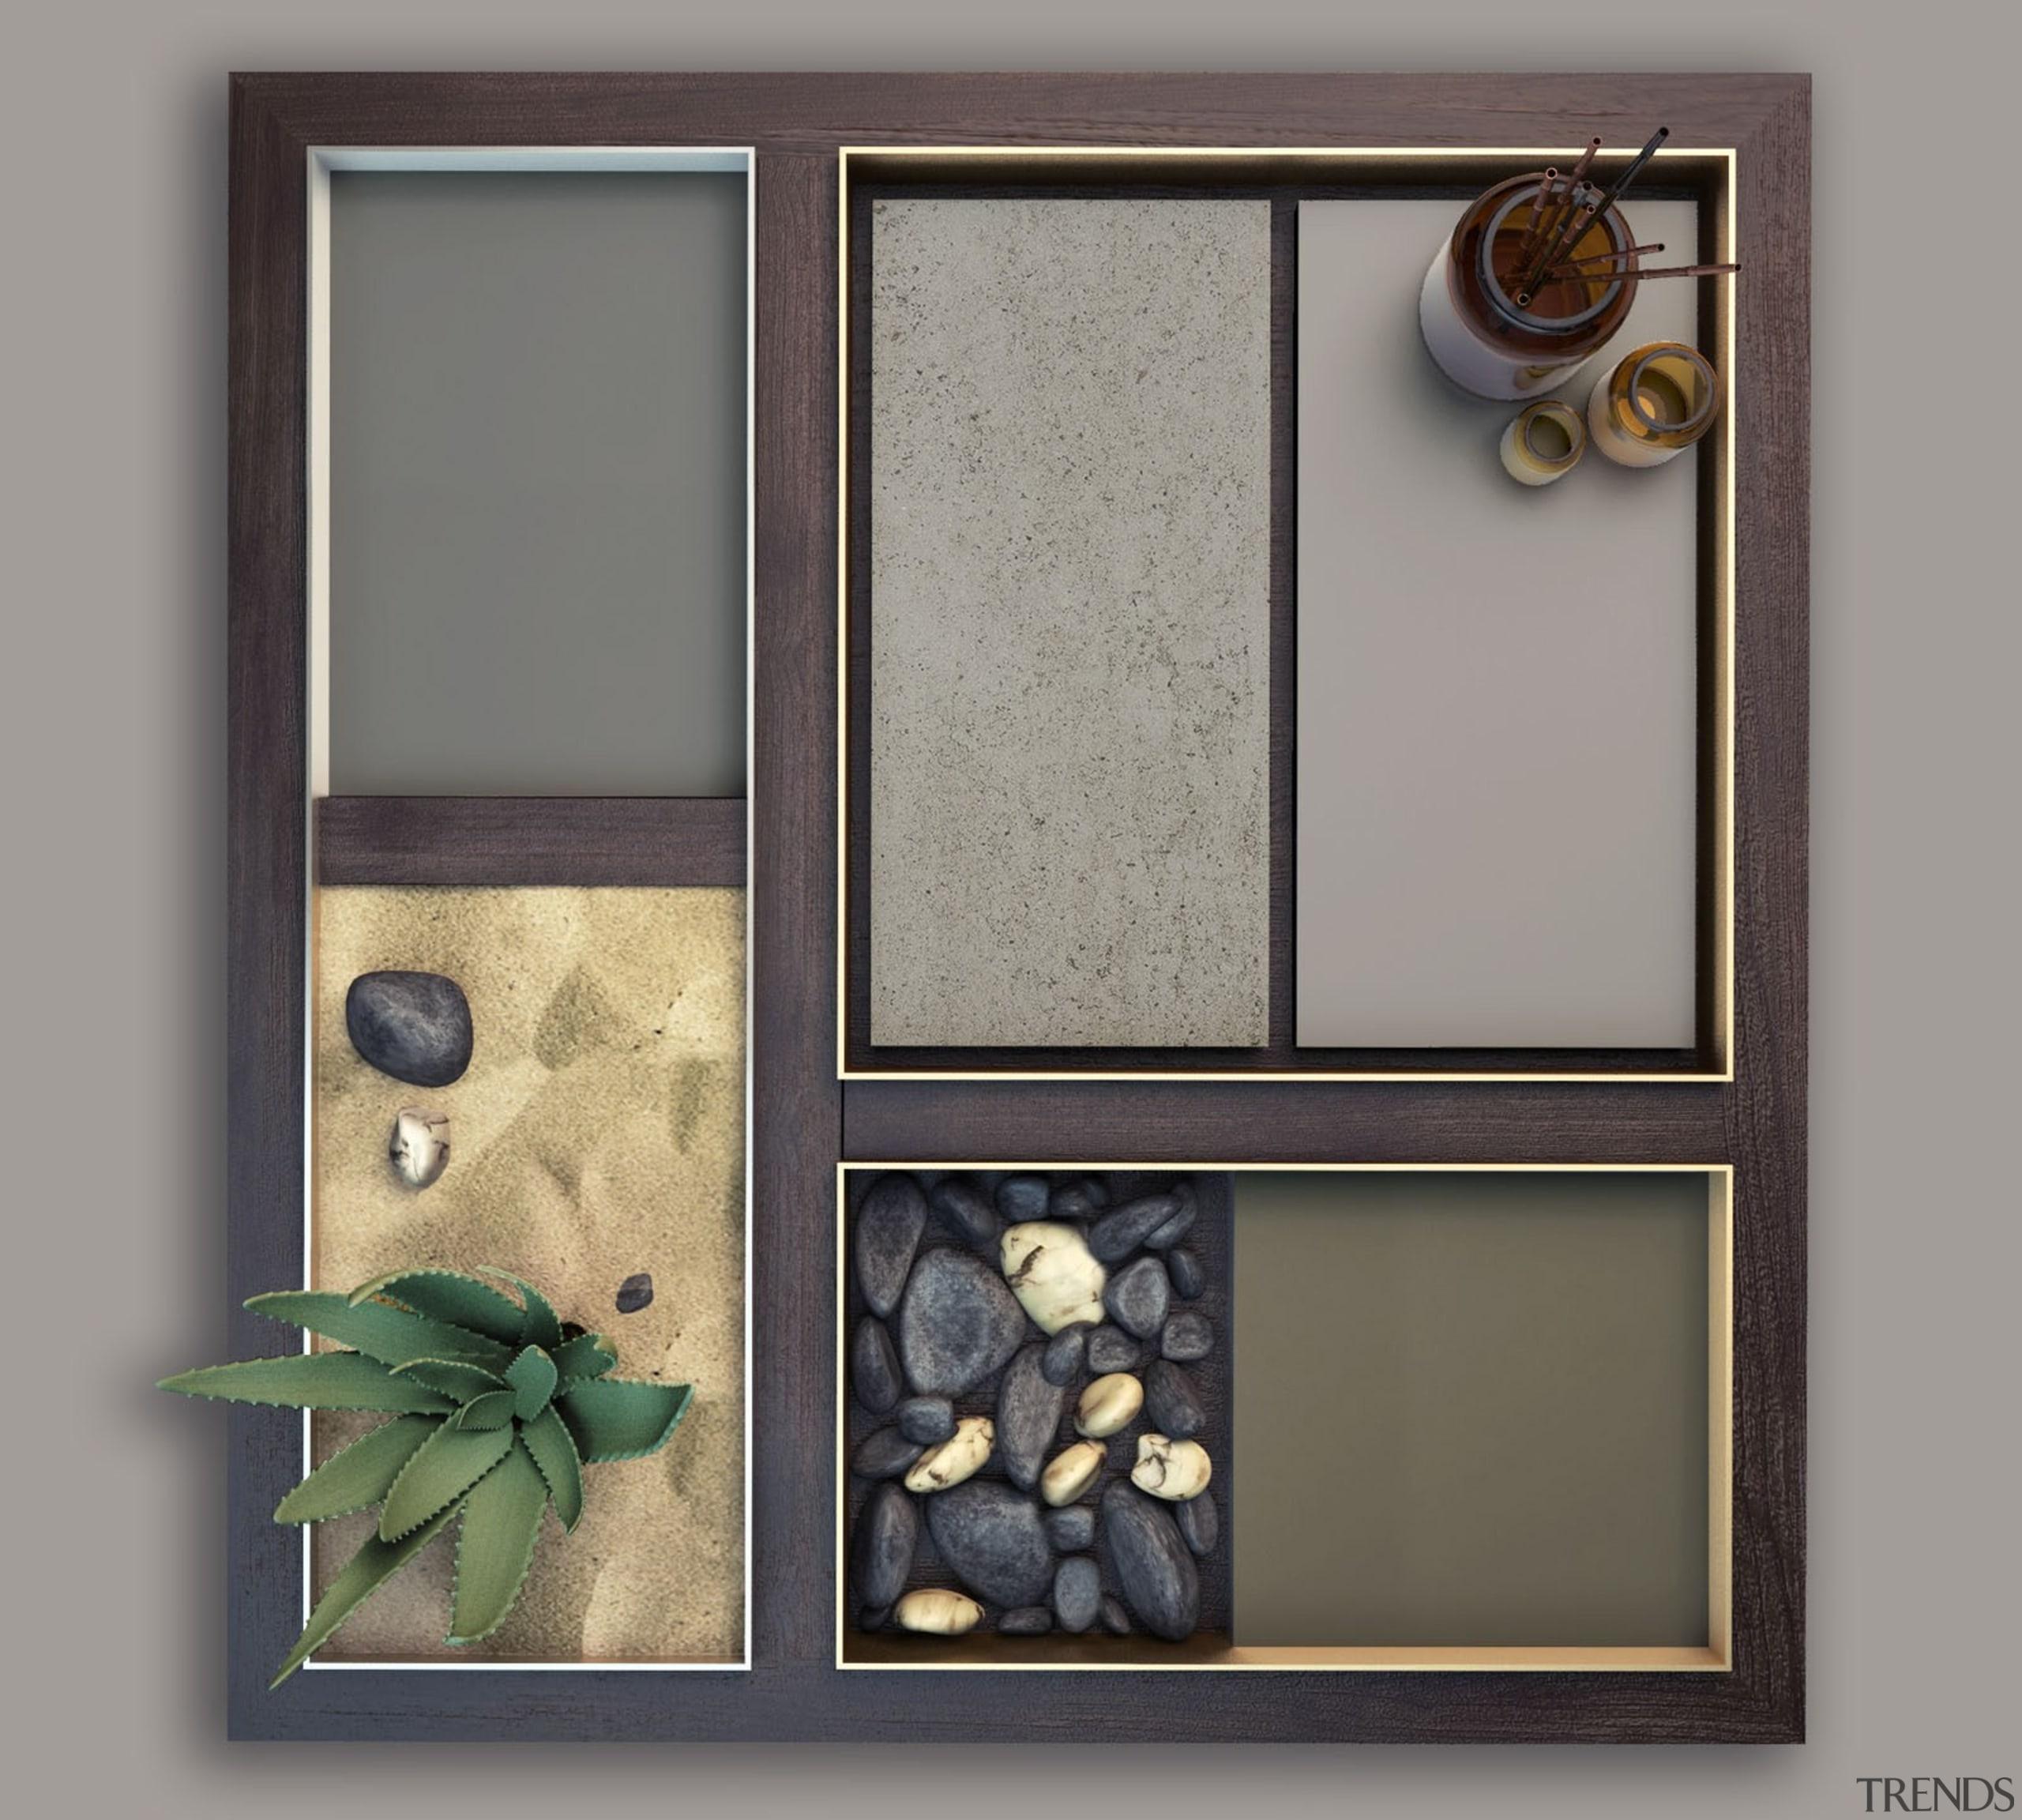 Ventus Korus Keon Galema - Ventus Korus Keon picture frame, window, gray